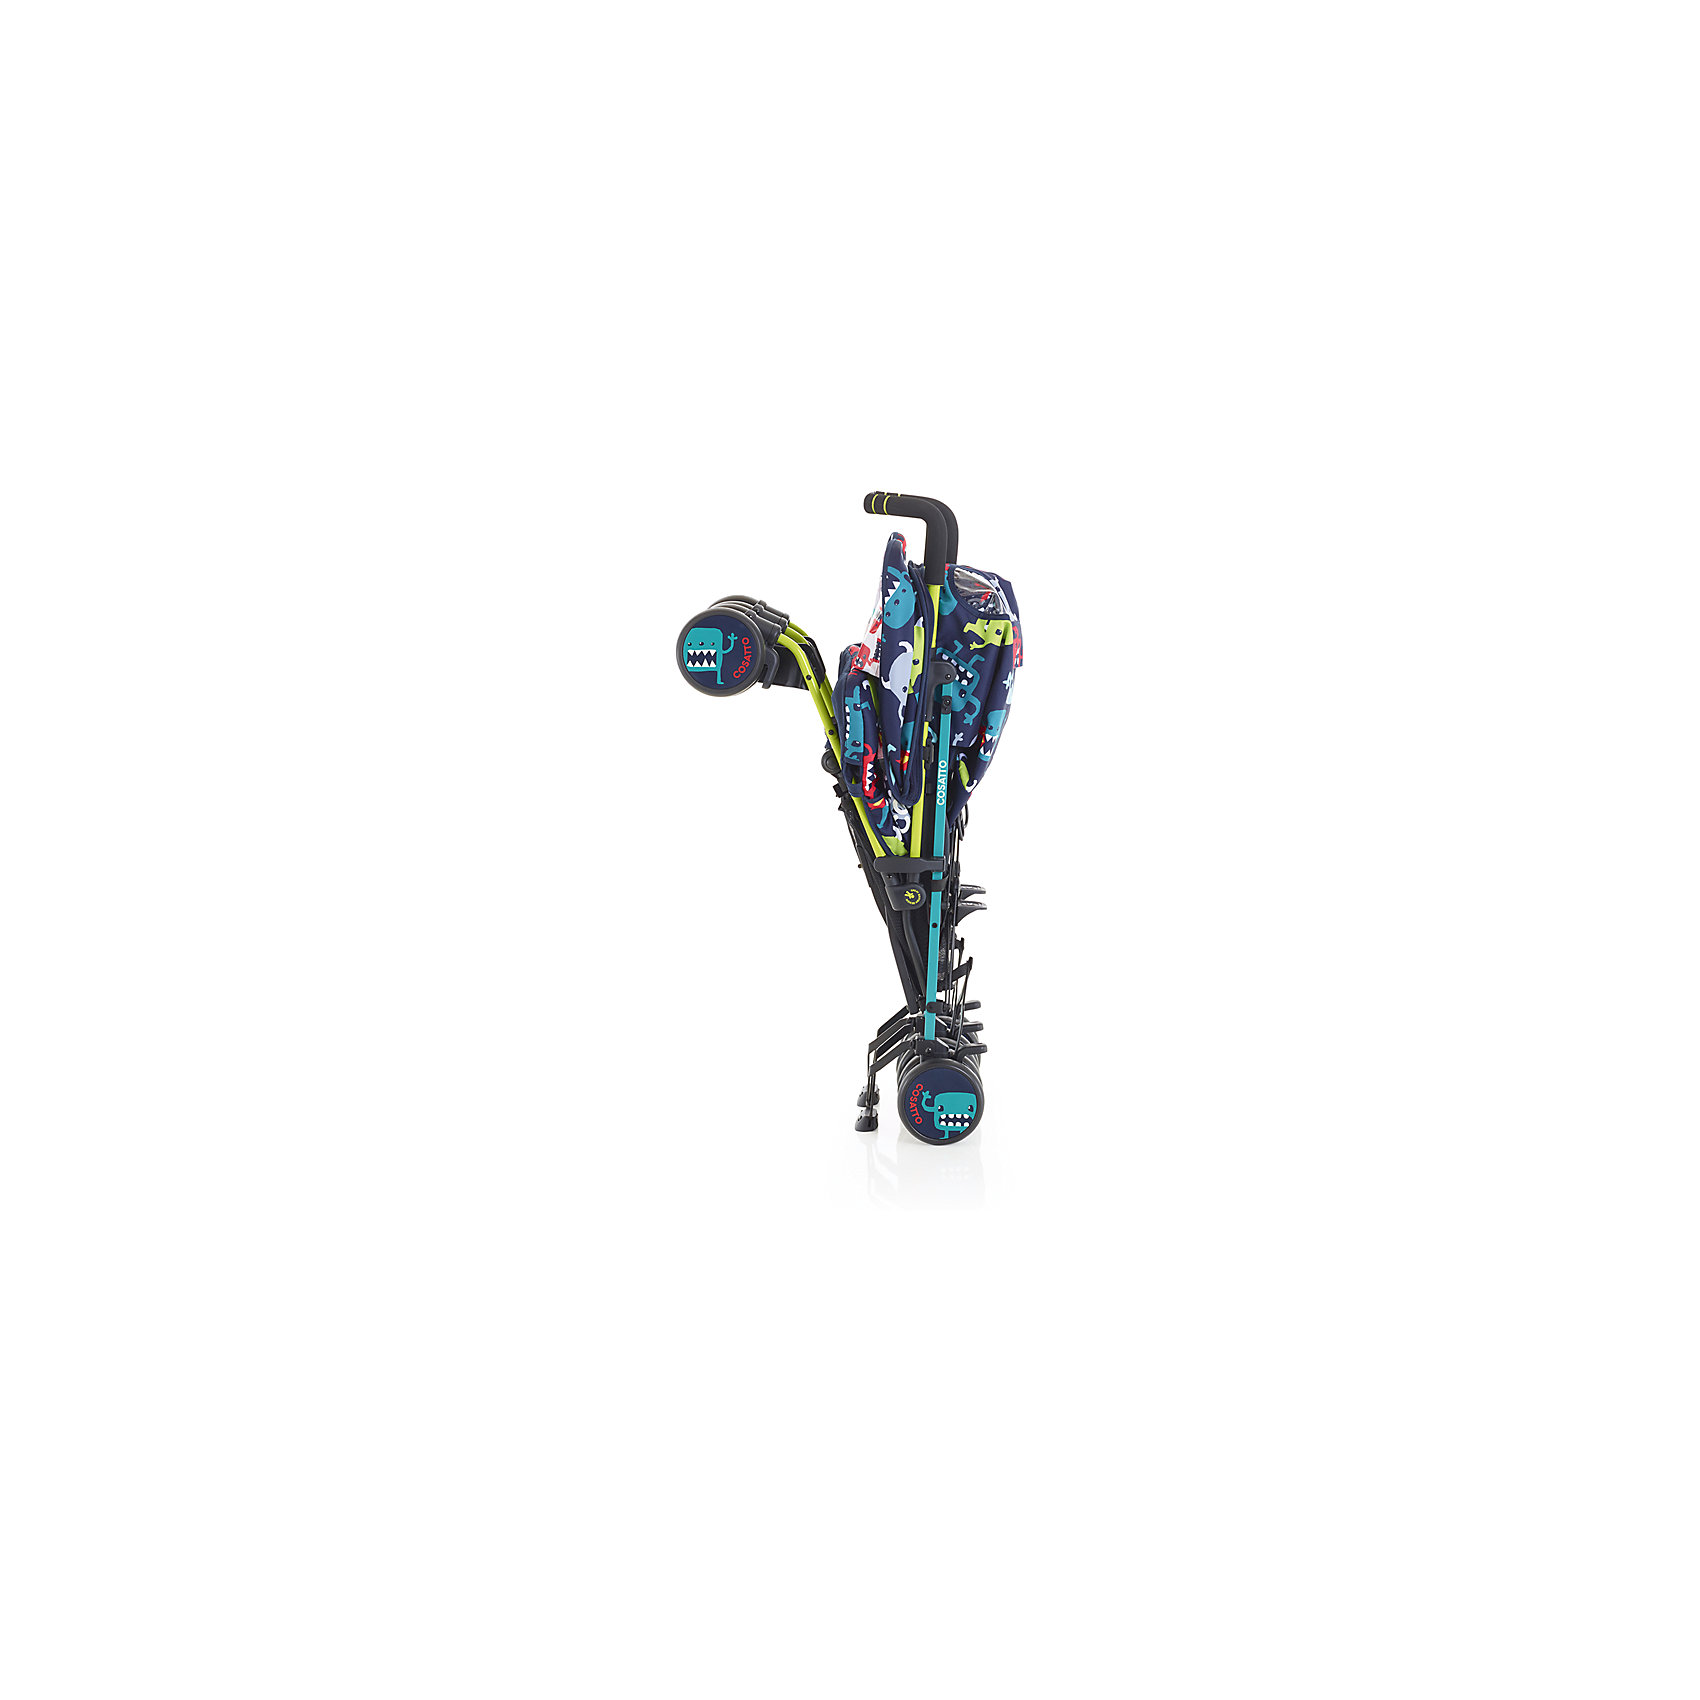 Прогулочная коляска для двойни SUPA DUPA TWIN, Cosatto, Cuddle Monster 2 (COSATTO)